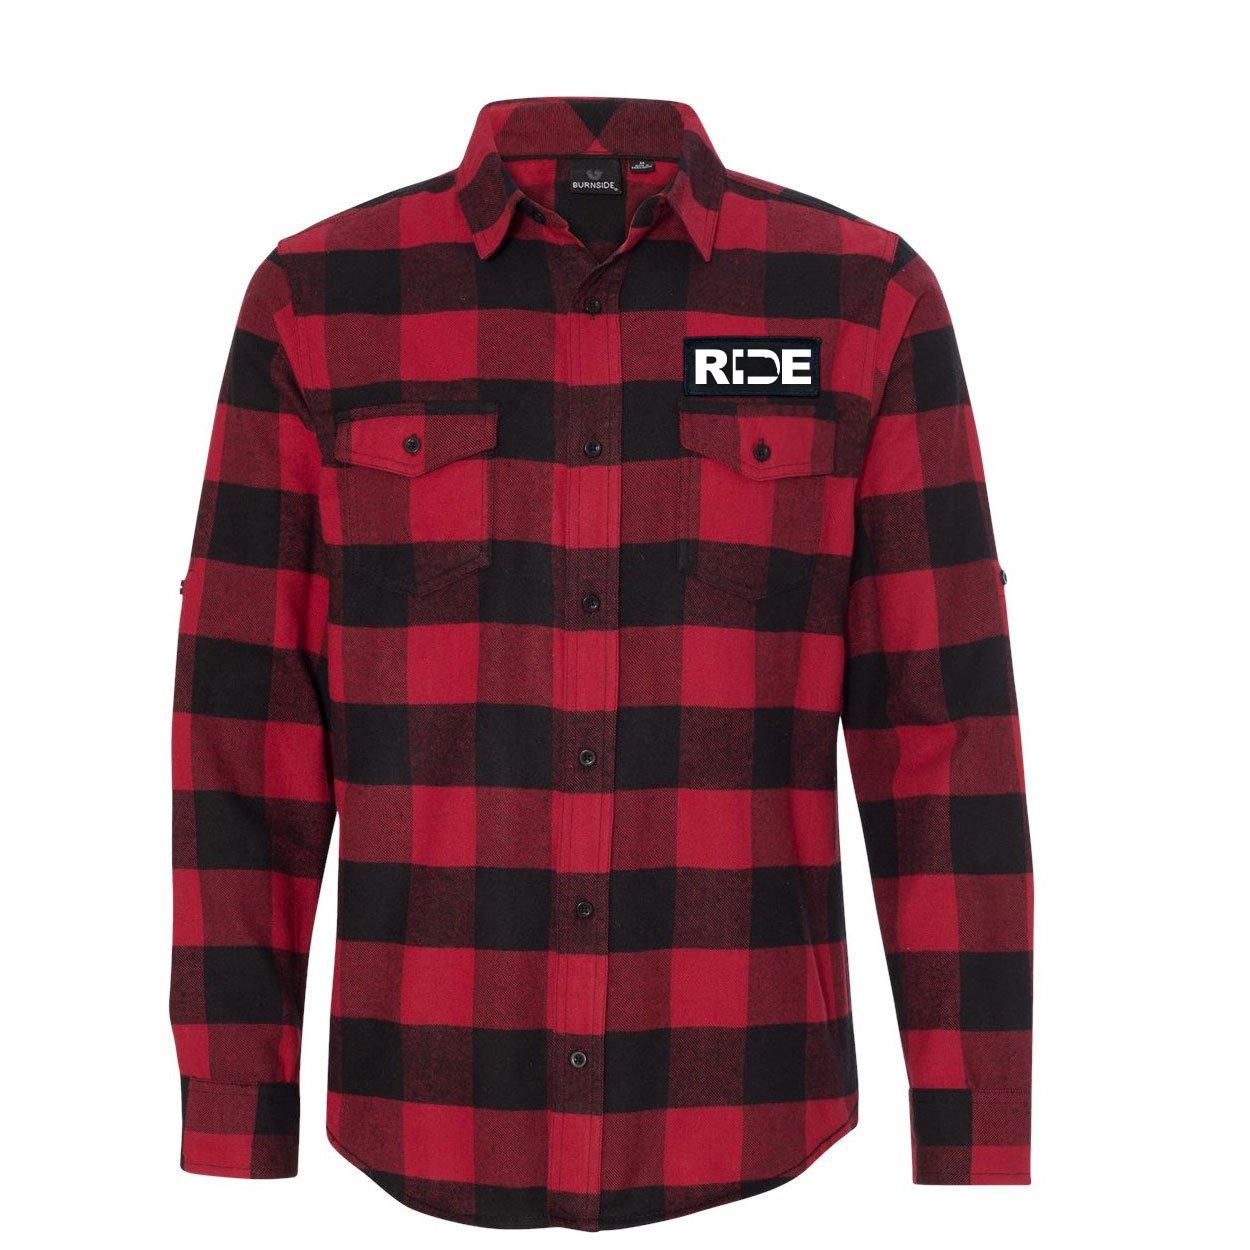 Ride Nebraska Classic Unisex Long Sleeve Woven Patch Flannel Shirt Red/Black Buffalo (White Logo)